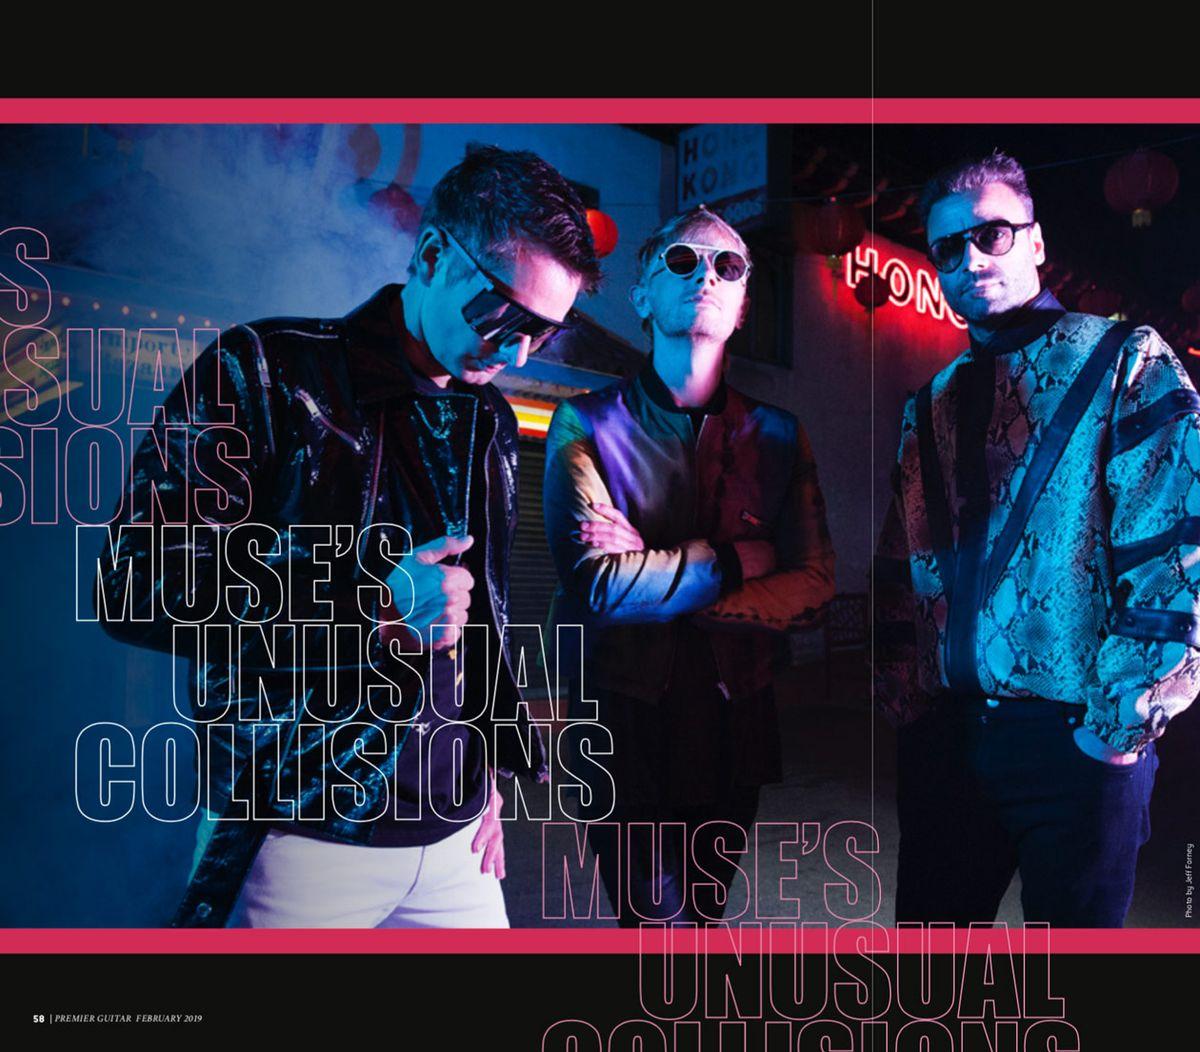 Muse's Matt Bellamy: Unusual Collisions